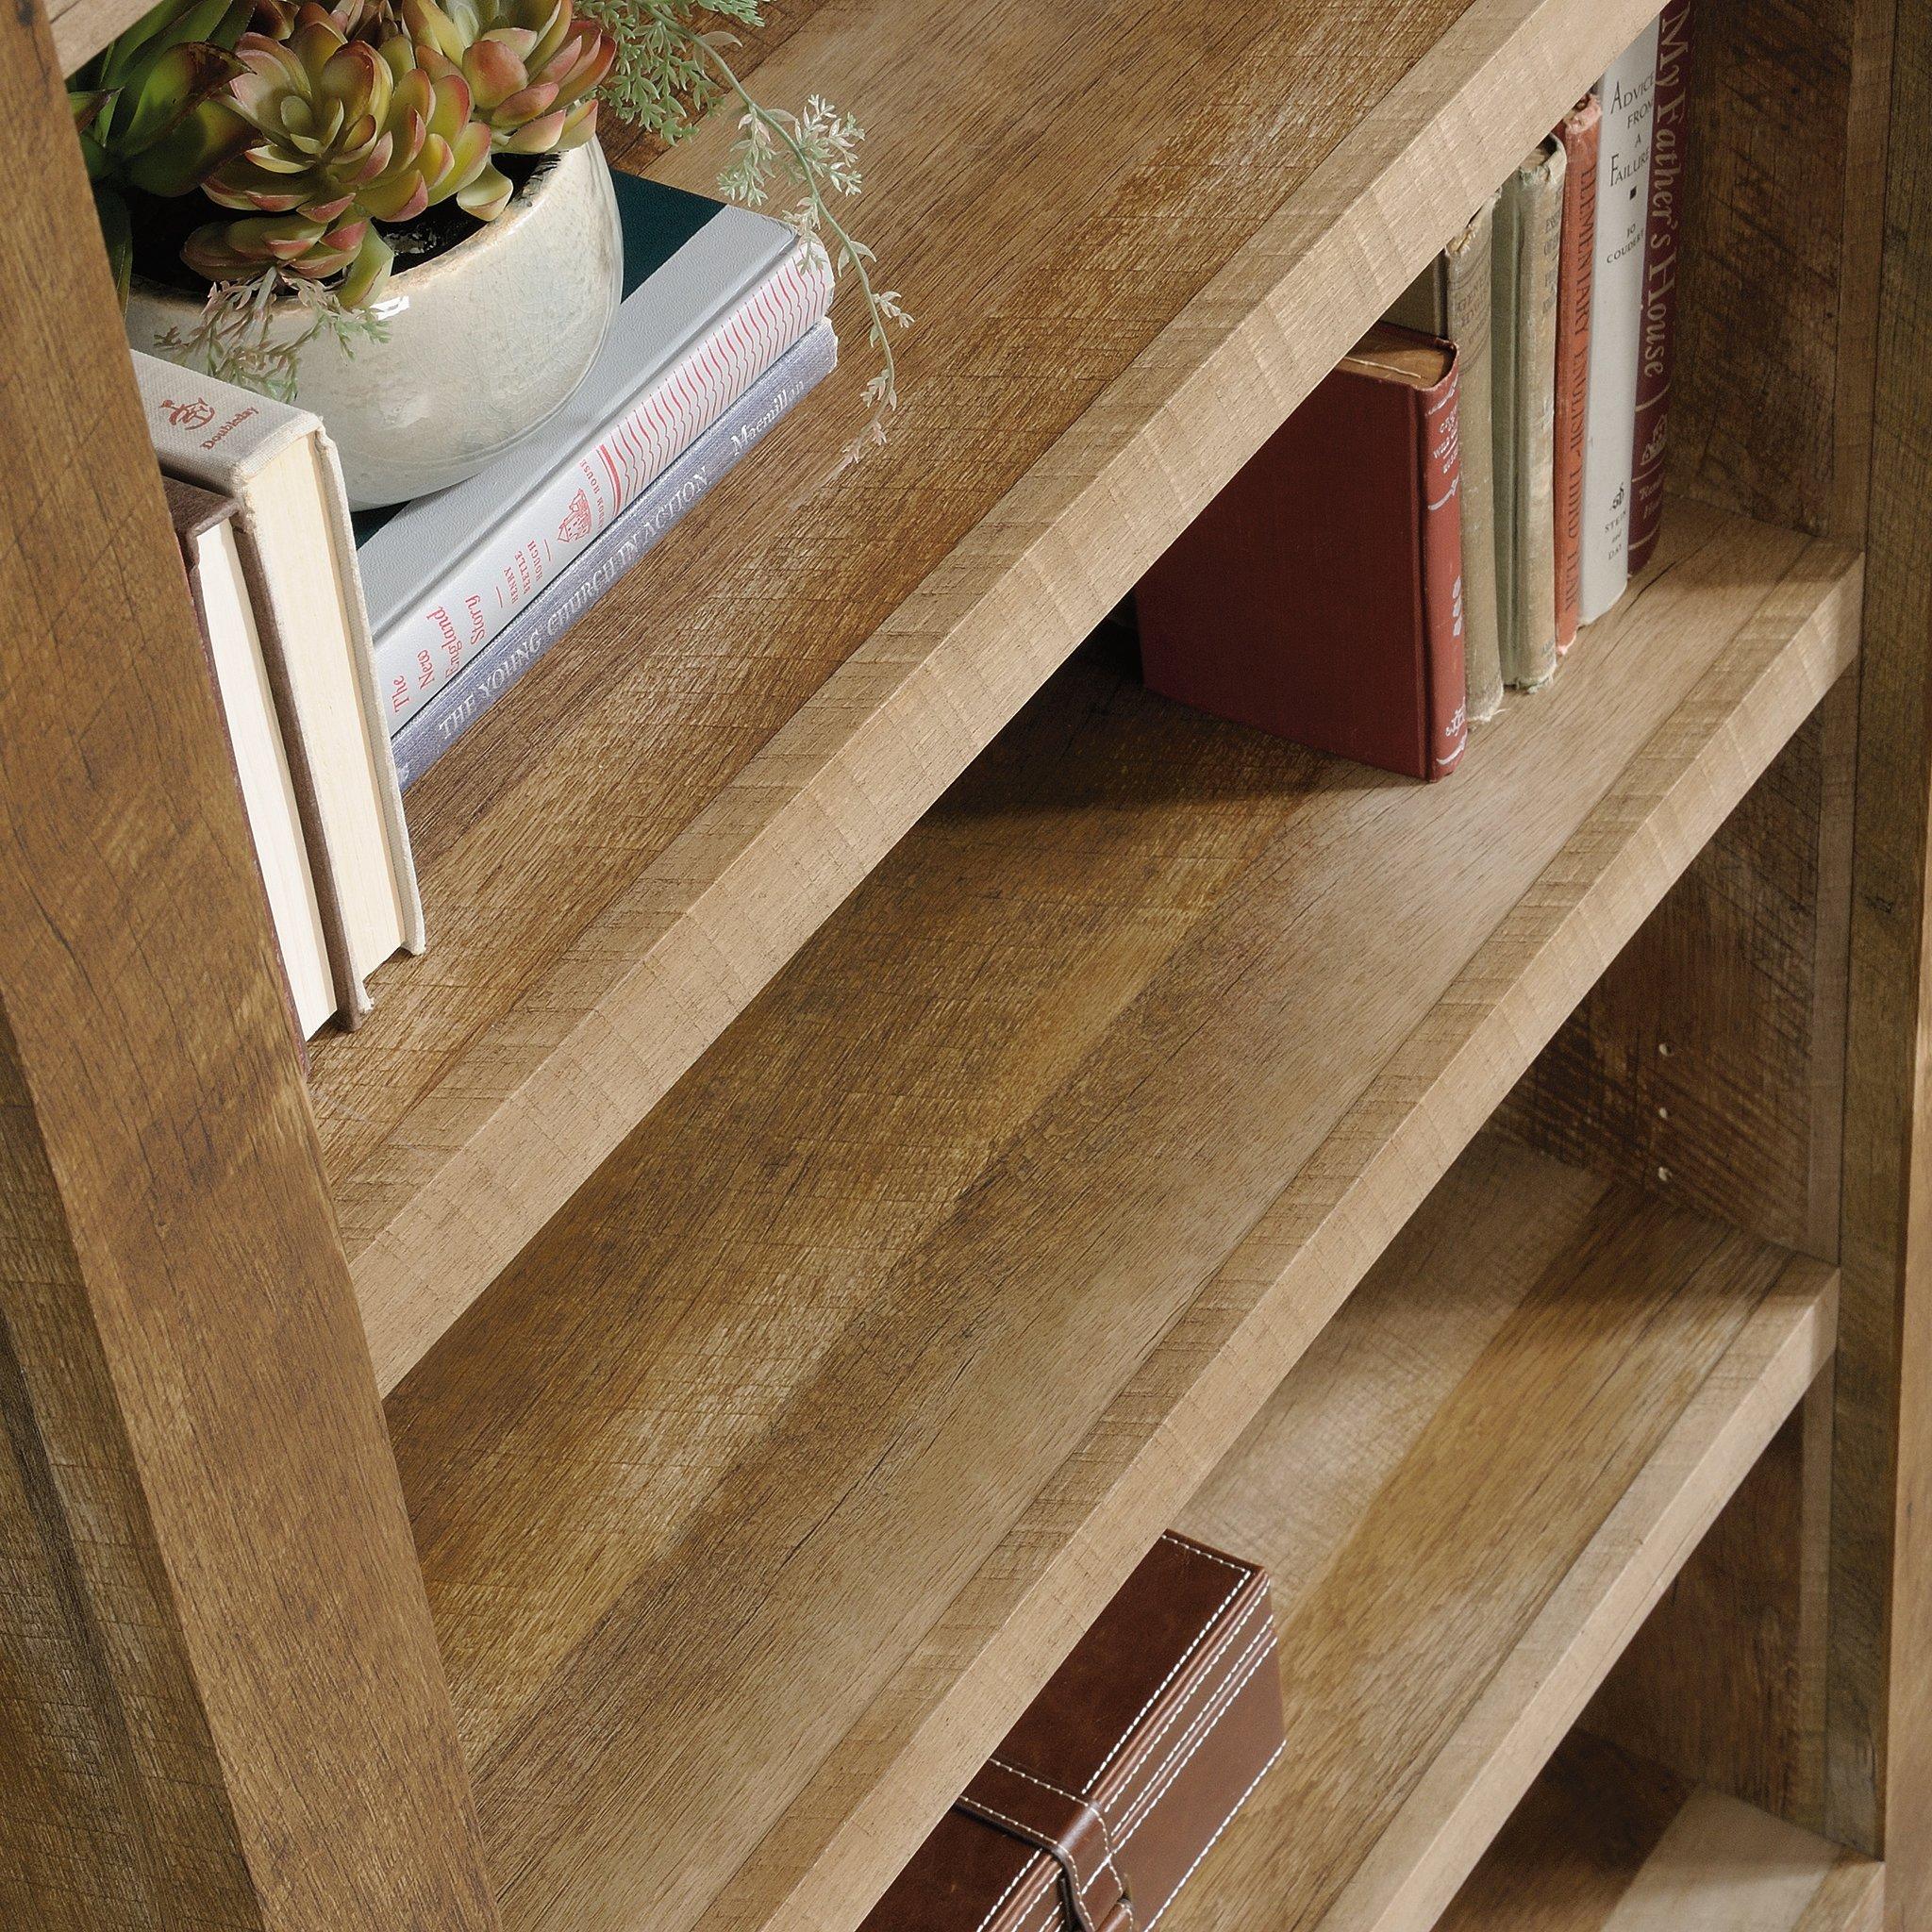 Sauder 418546 Dakota Pass 5-Shelf Bookcase, L: 33.78'' x W: 12.52'' x H: 71.1, Craftsman Oak finish by Sauder (Image #7)